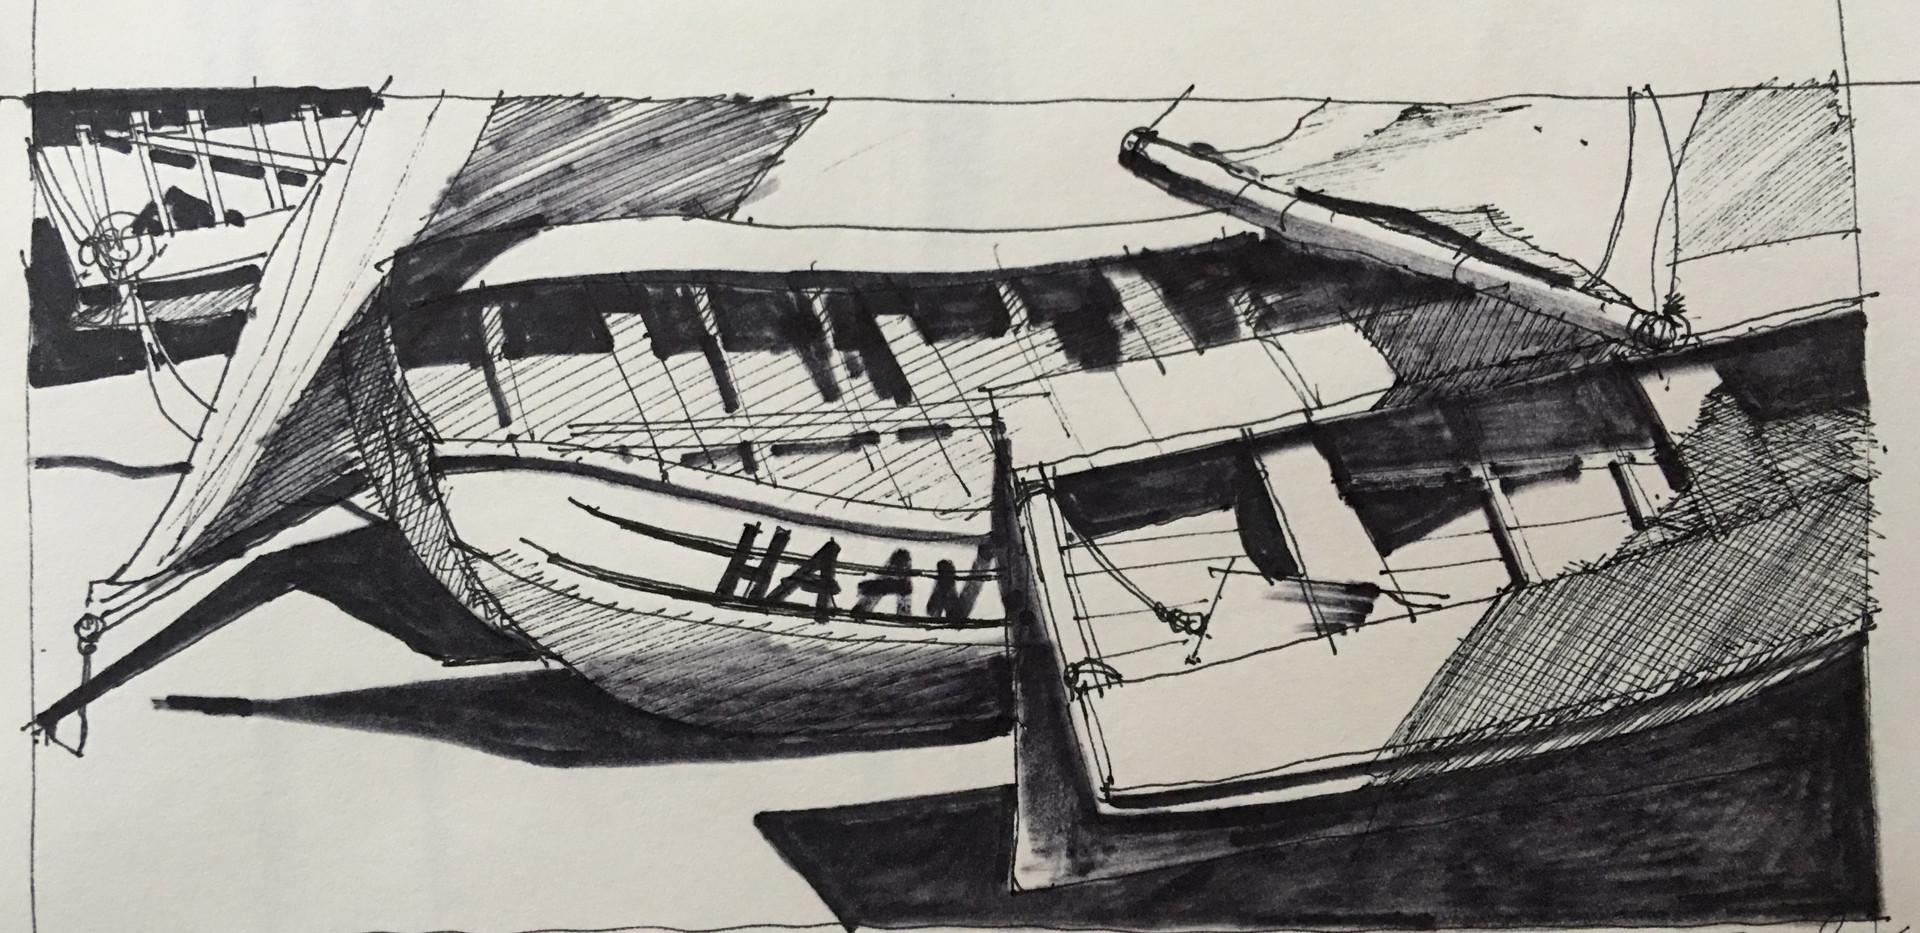 Wood Boat Center #1